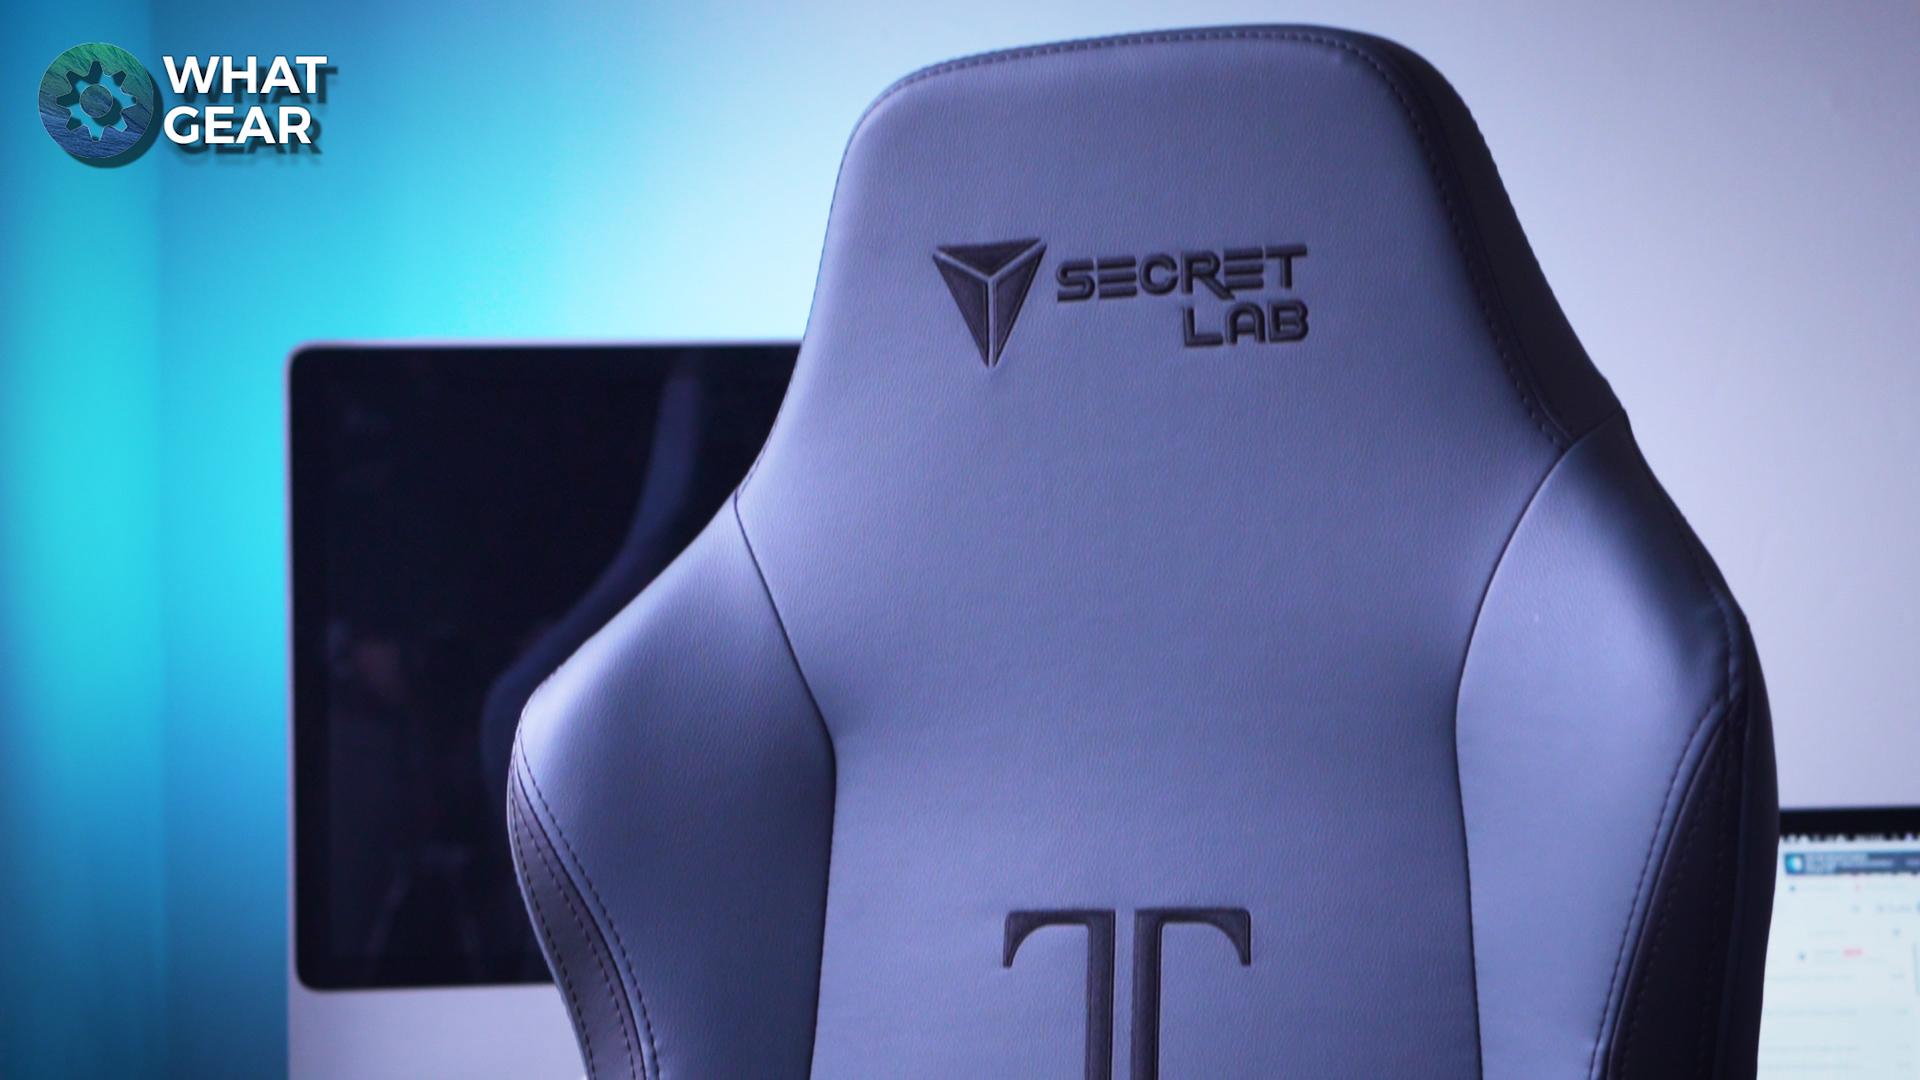 secretlab gaing chaire review.jpg